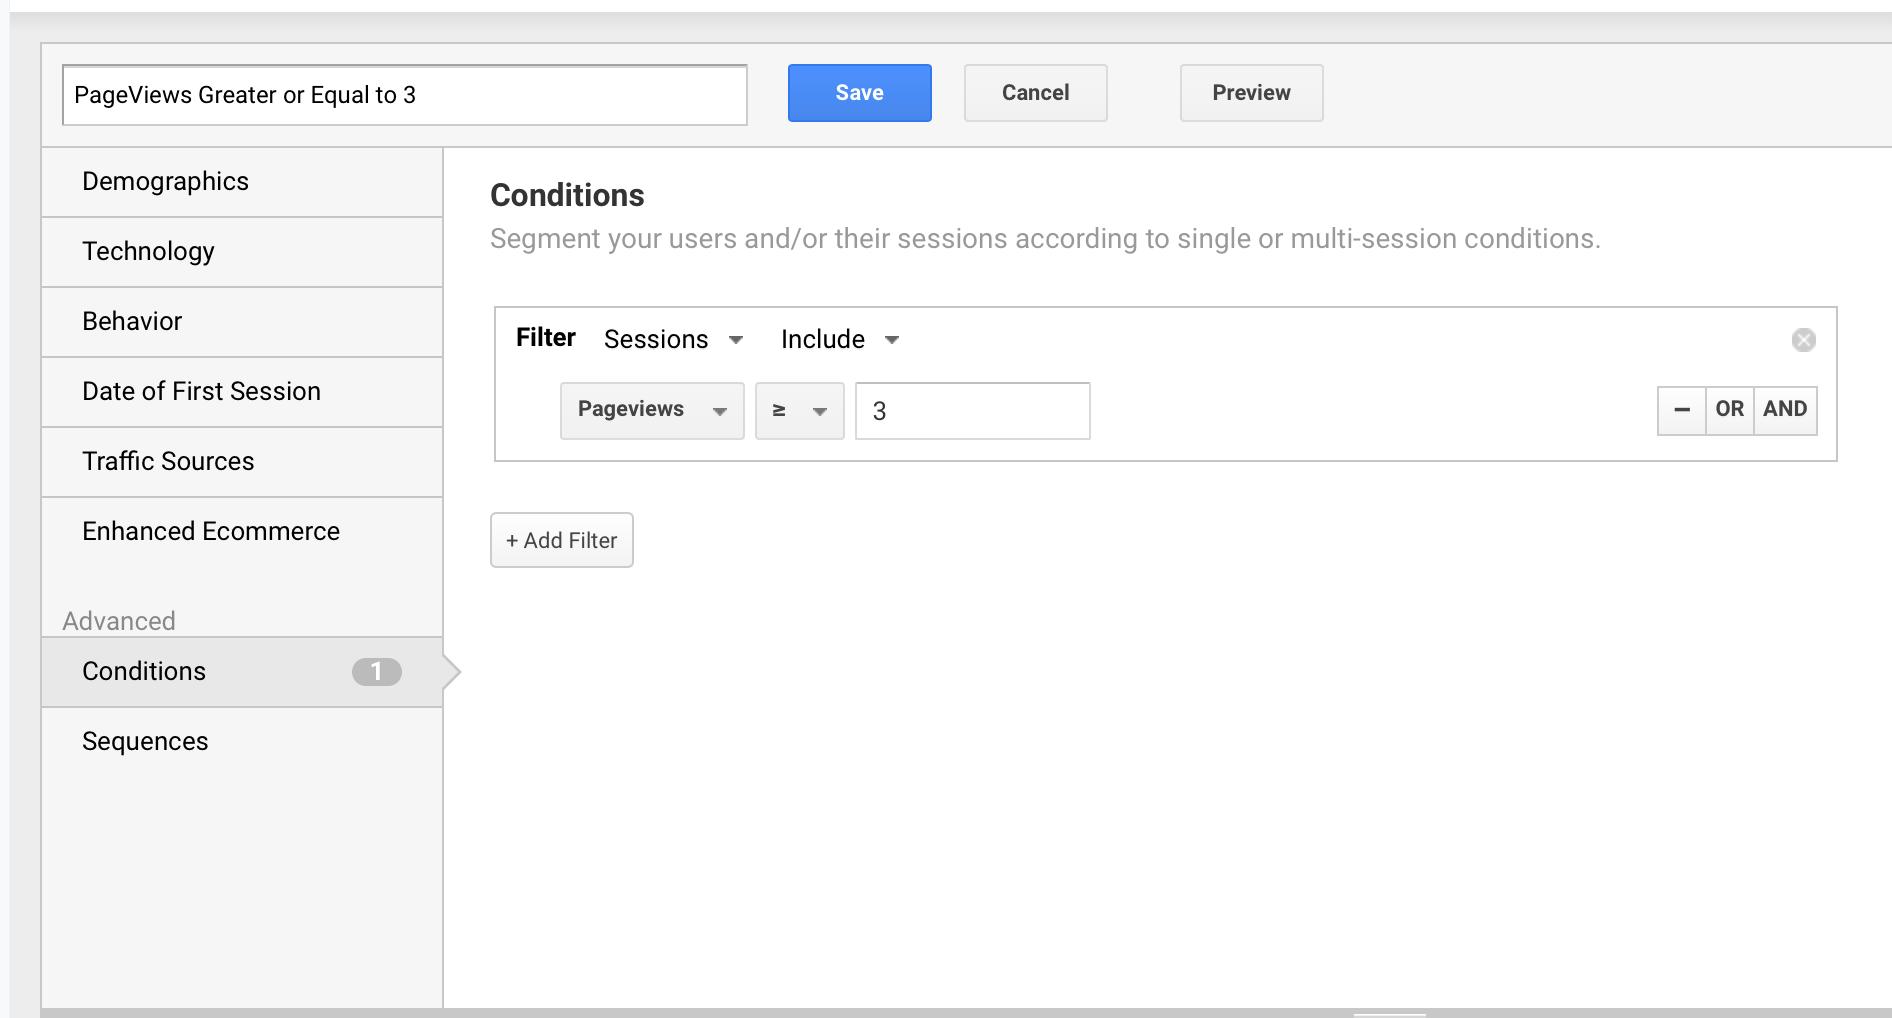 More than 3 Pageviews Custom Segment